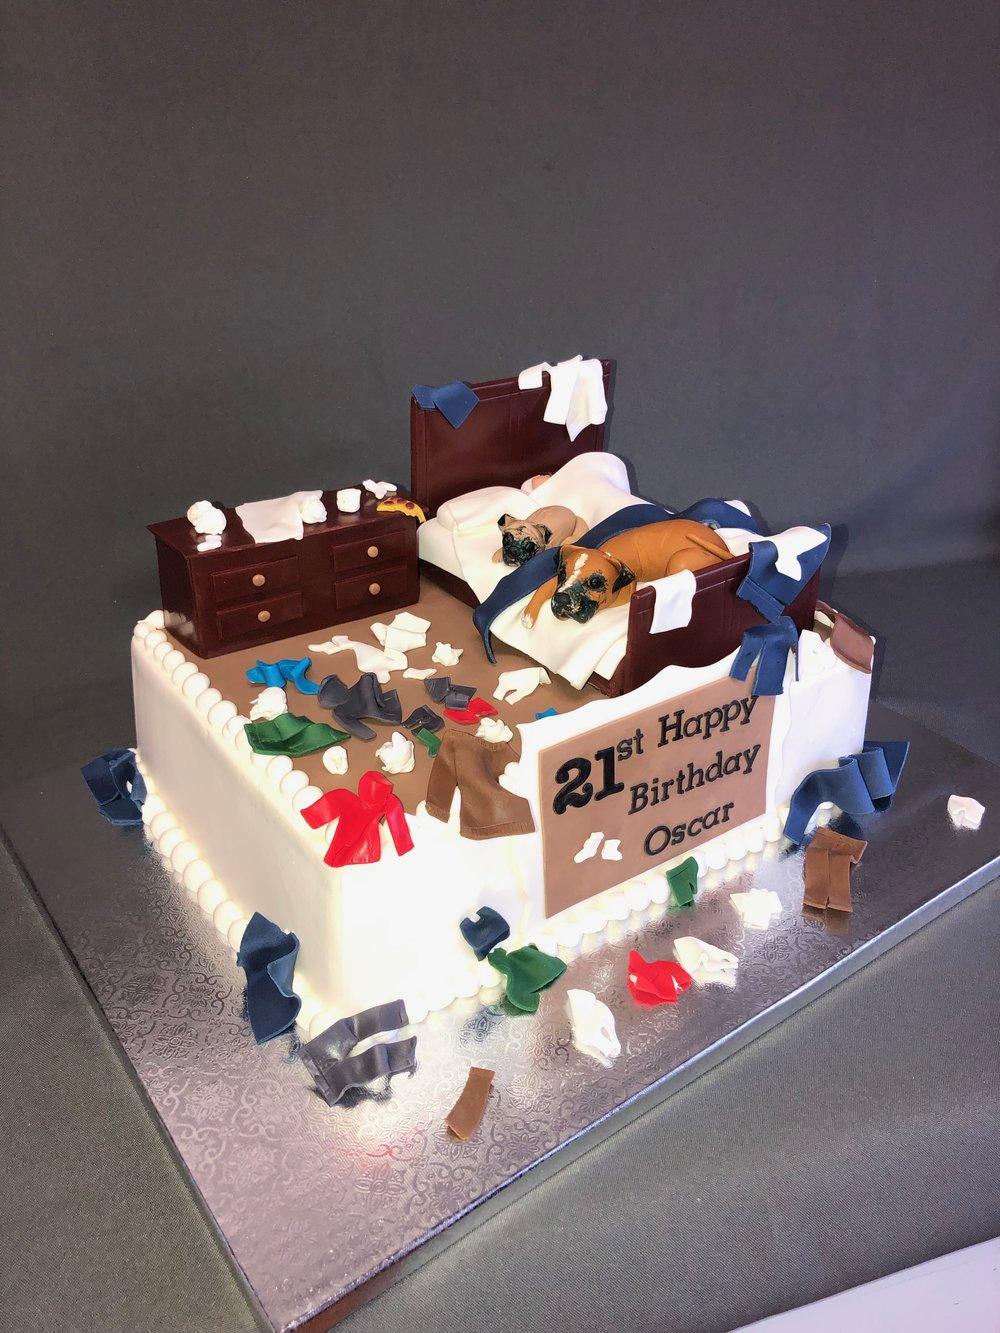 21st Birthday cake New Jersey